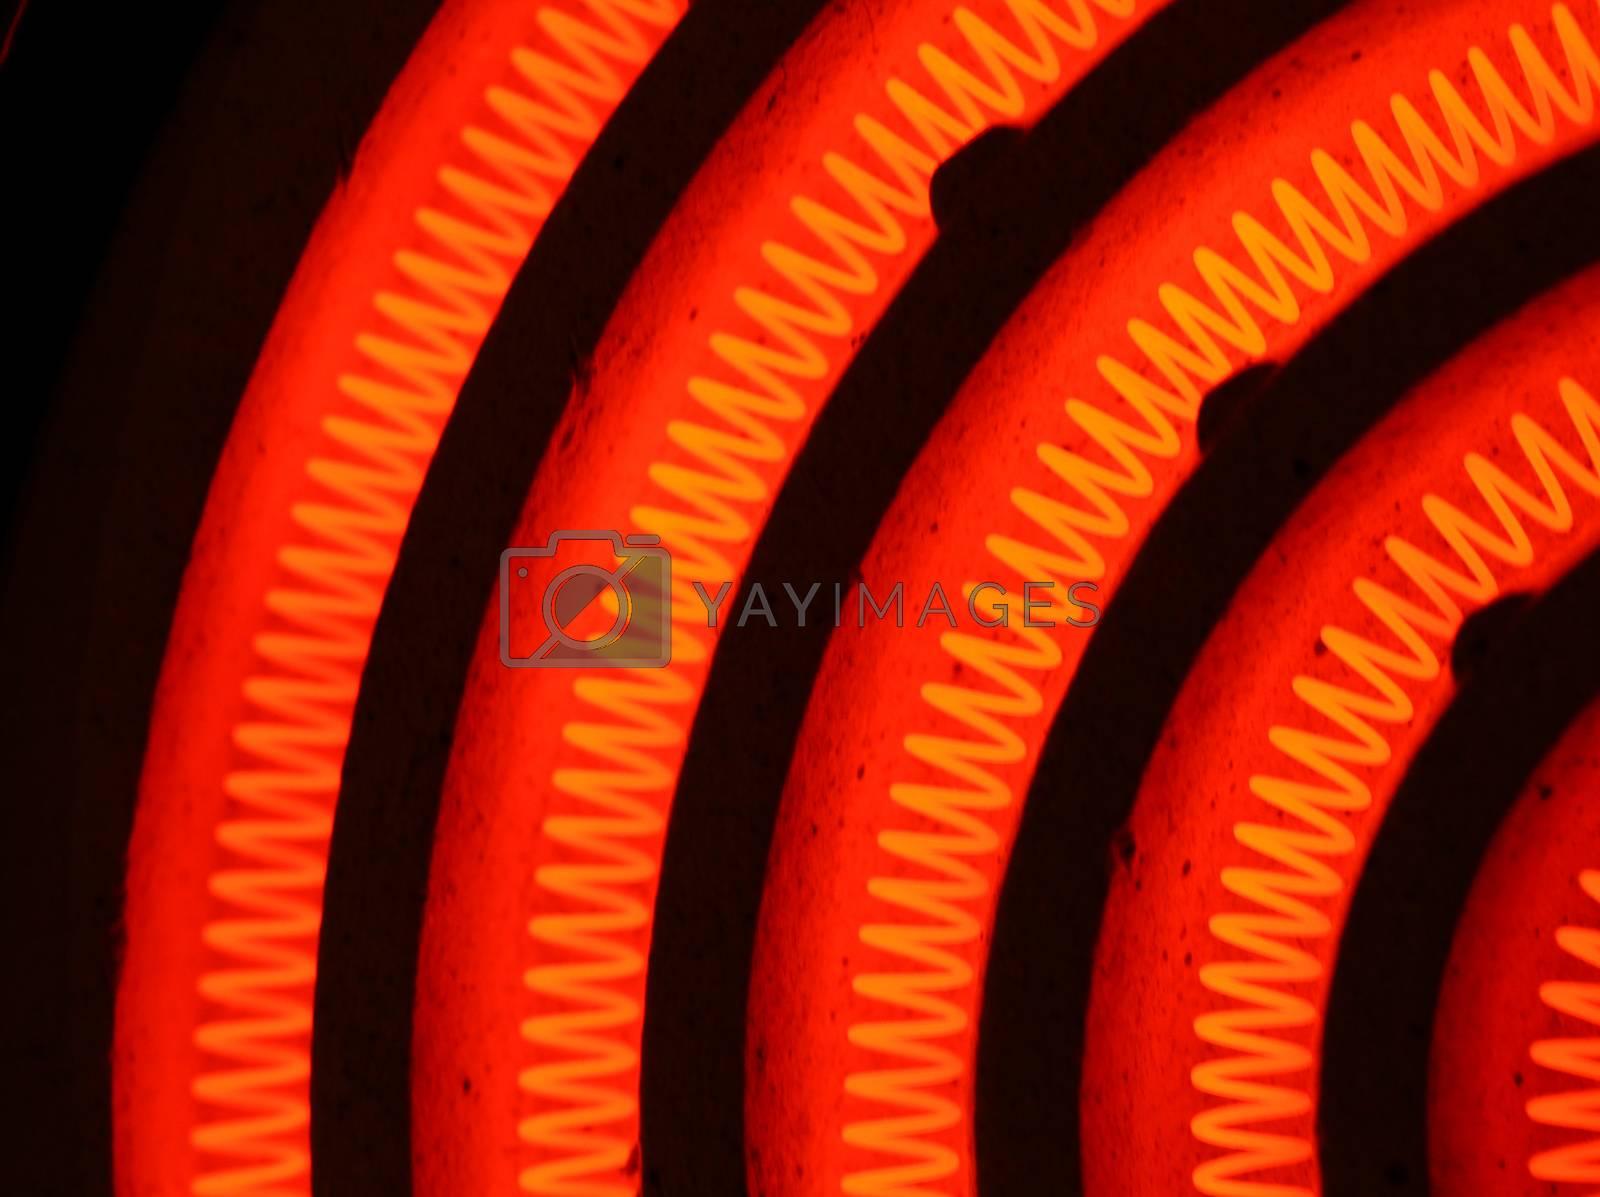 Royalty free image of Heating Element by janaka